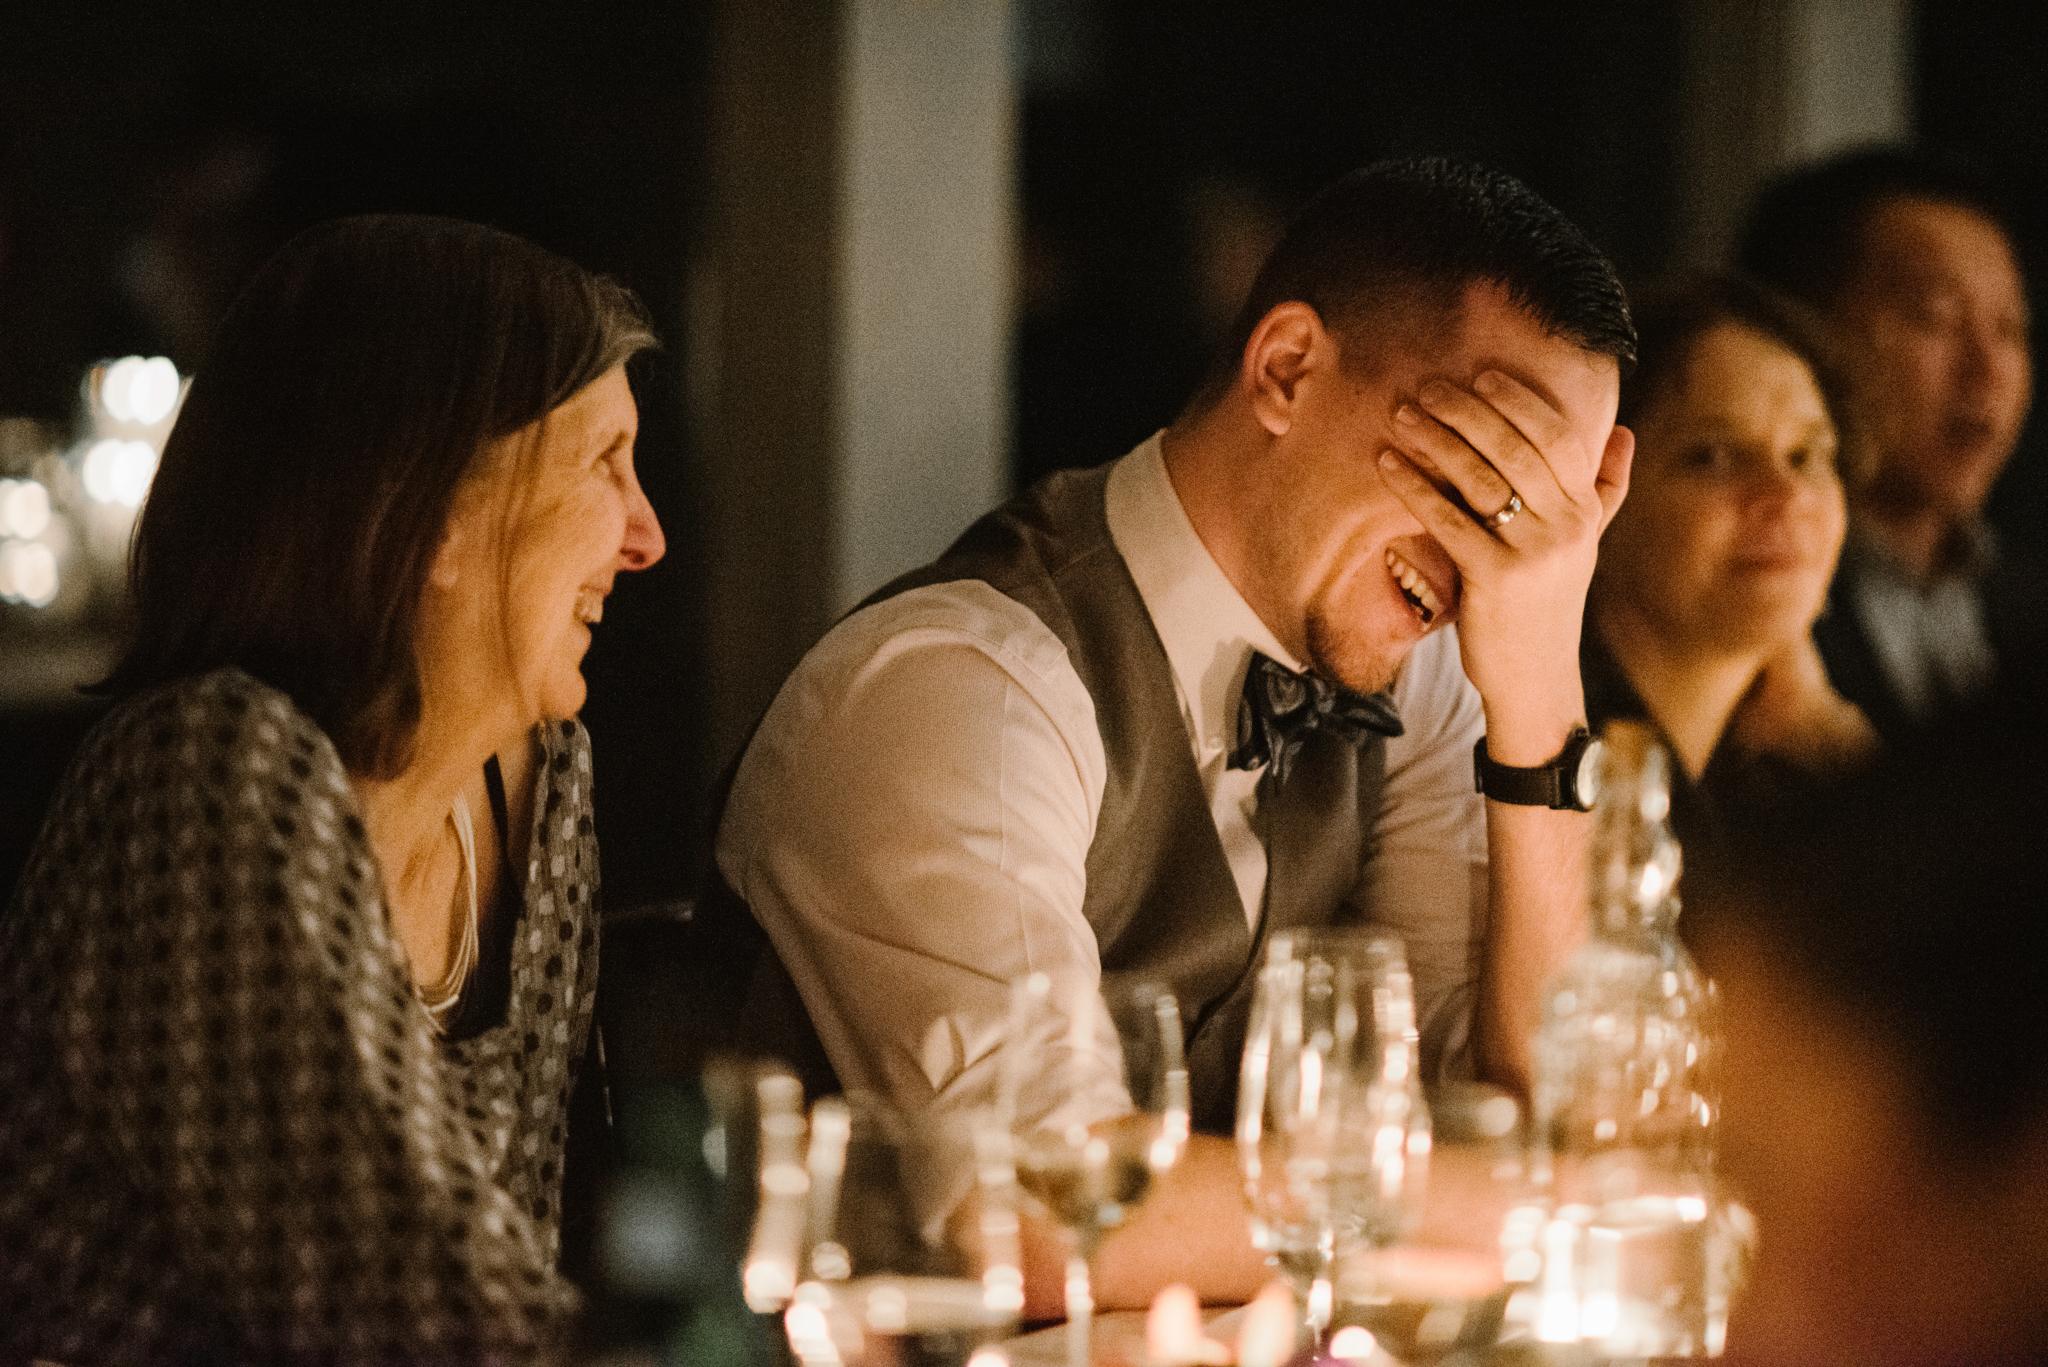 Intimate Dinner Wedding - Small Wedding with Candlelit Dinner - Sperryville Virginia Wedding - Backyard Wedding - Flourish Root Wedding Flowers - White Sails Creative Wedding - Cozy Wedding - Casual Wedding - Intimate Wedding_64.jpg